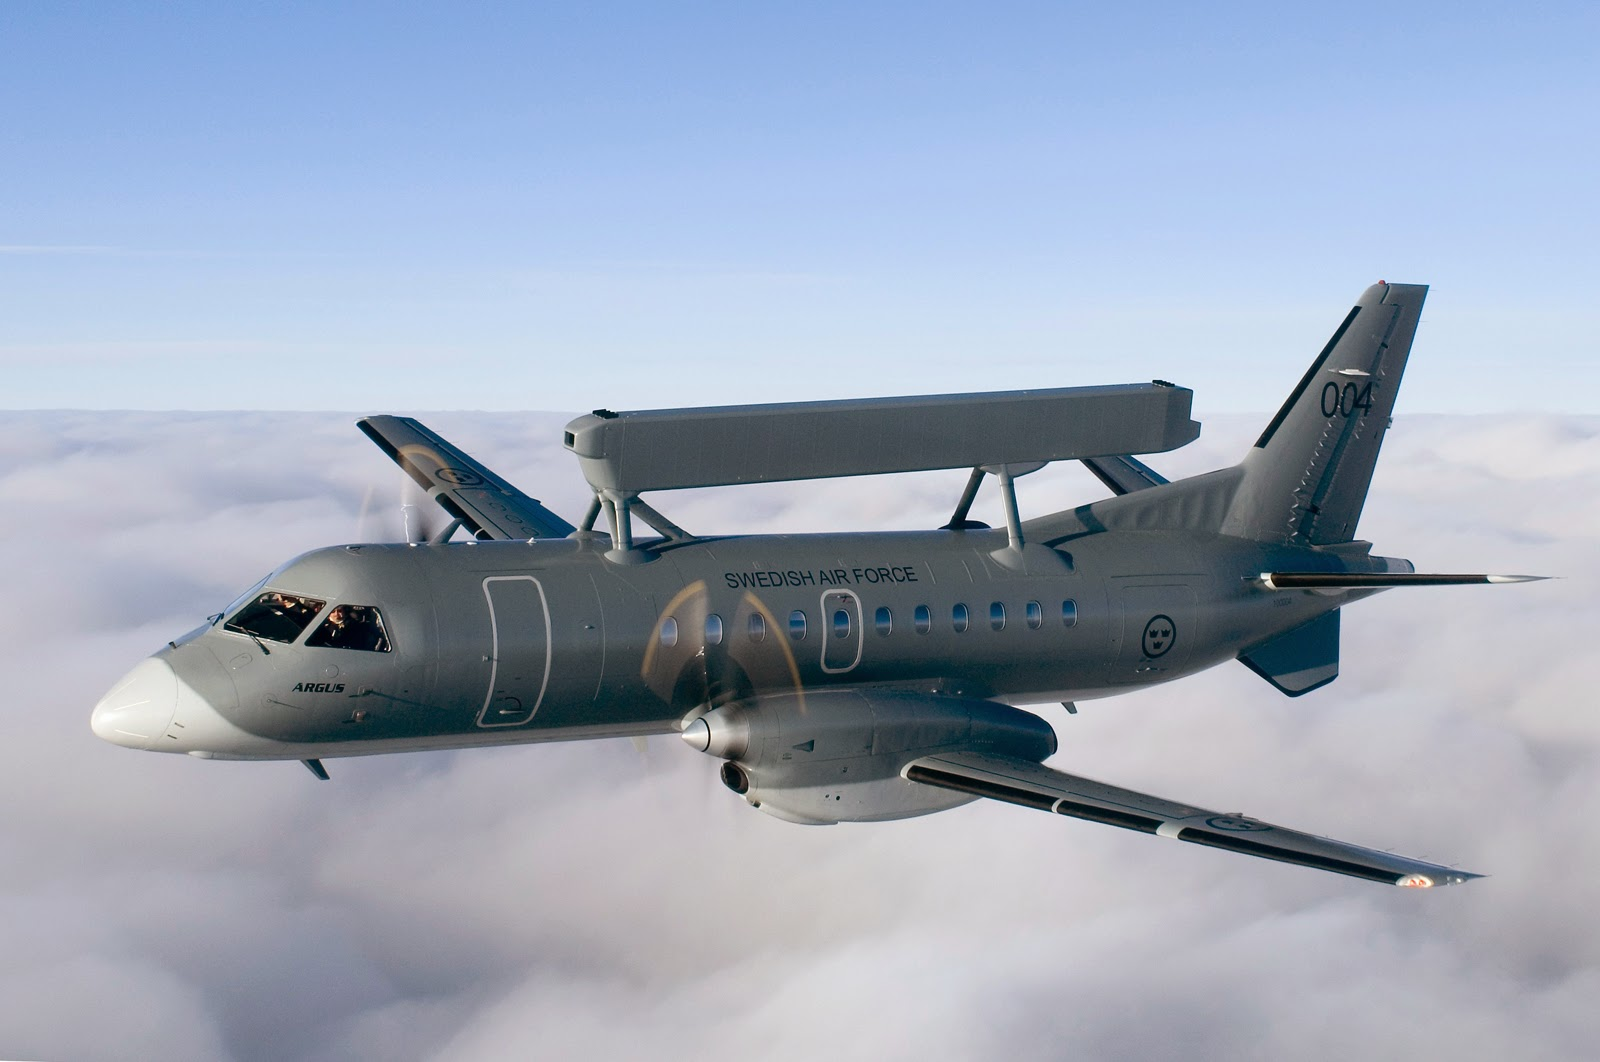 Saab 340 Erieye. image: aviationnews.eu